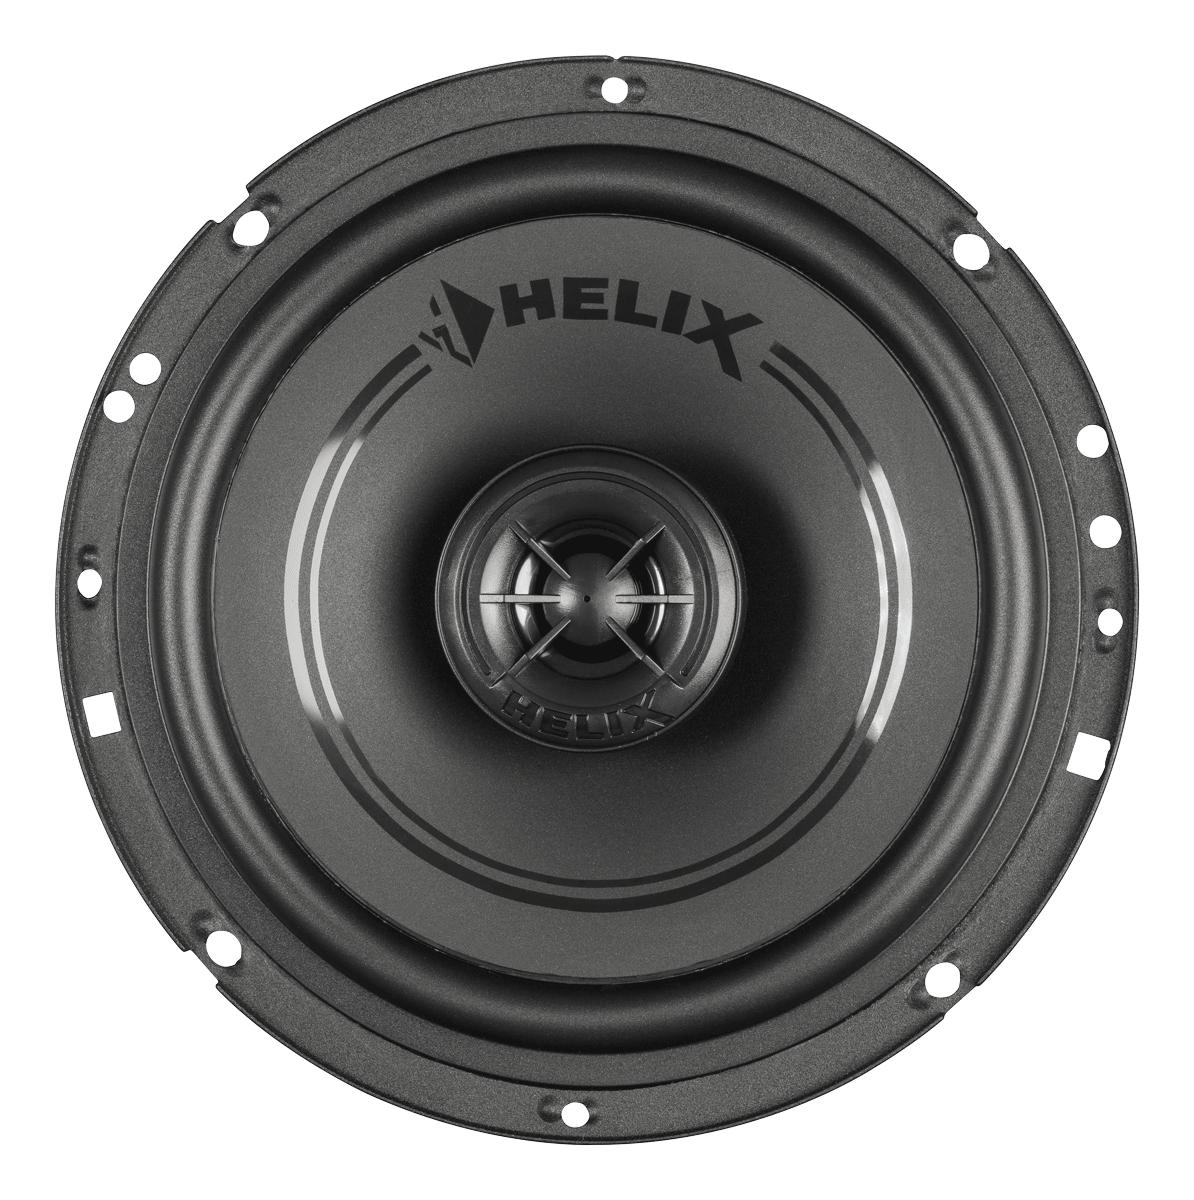 Reproduktory Helix F6X